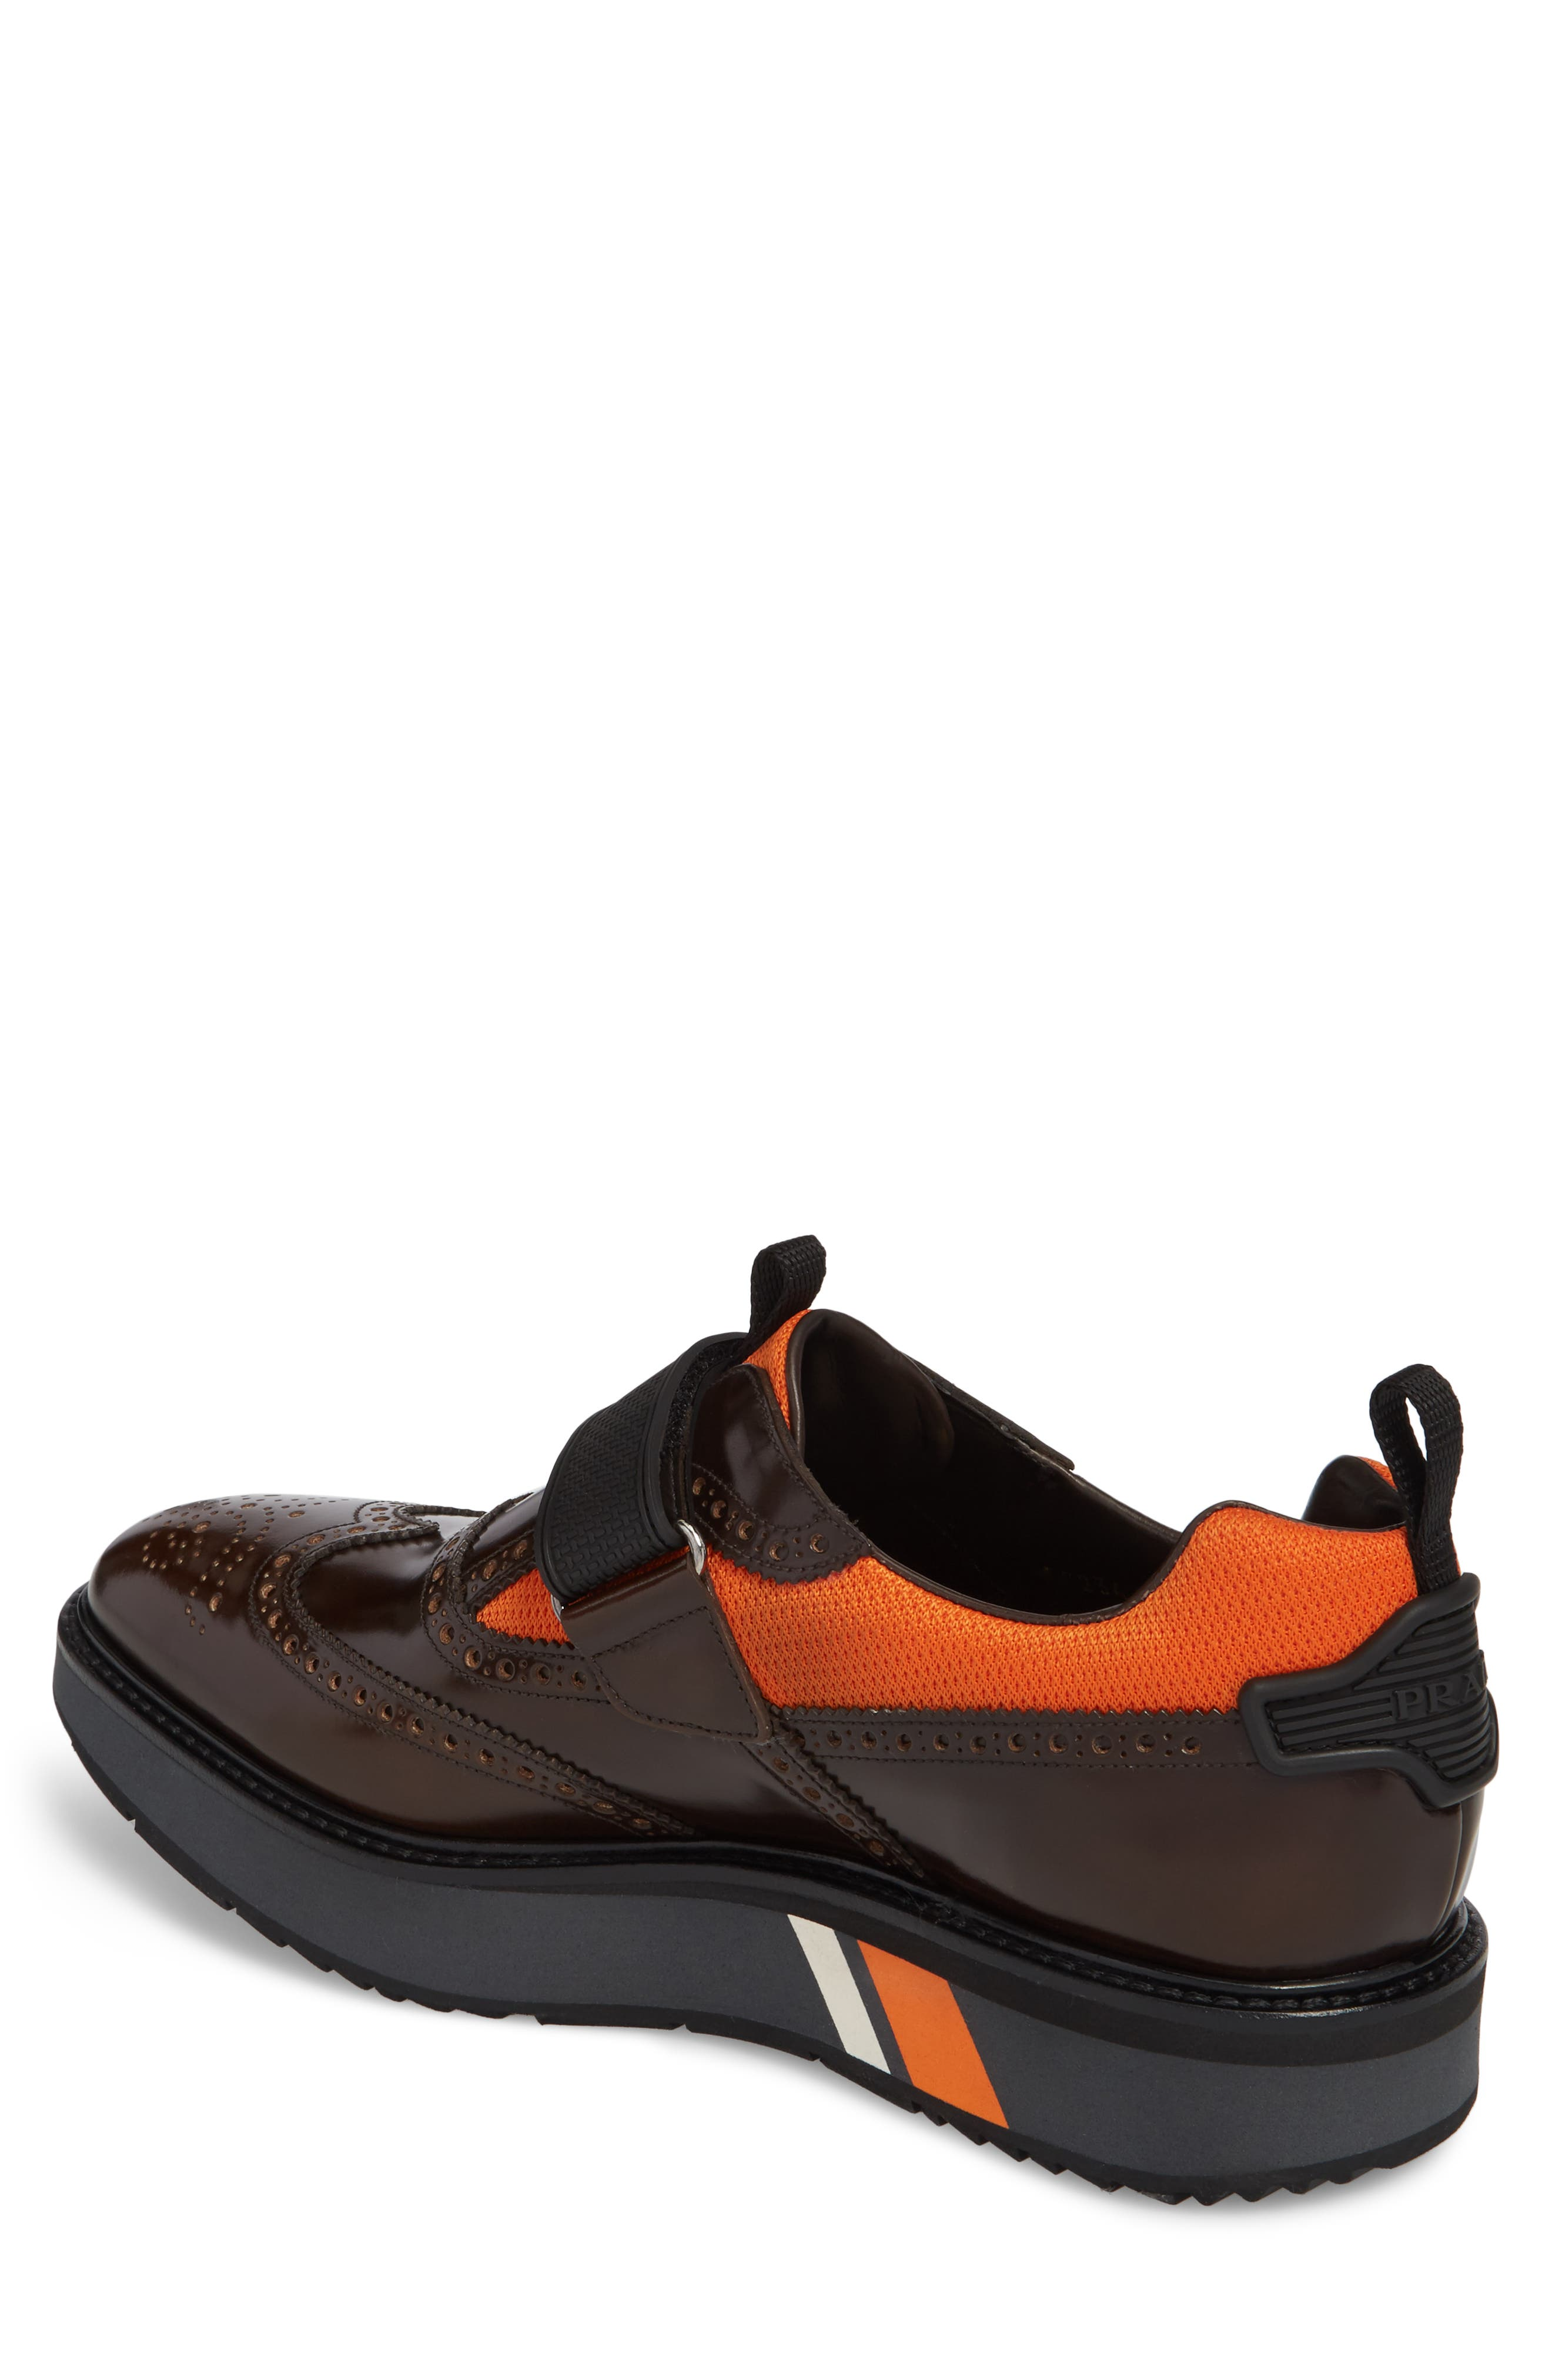 Strap Wingtip Sneaker,                             Alternate thumbnail 2, color,                             200